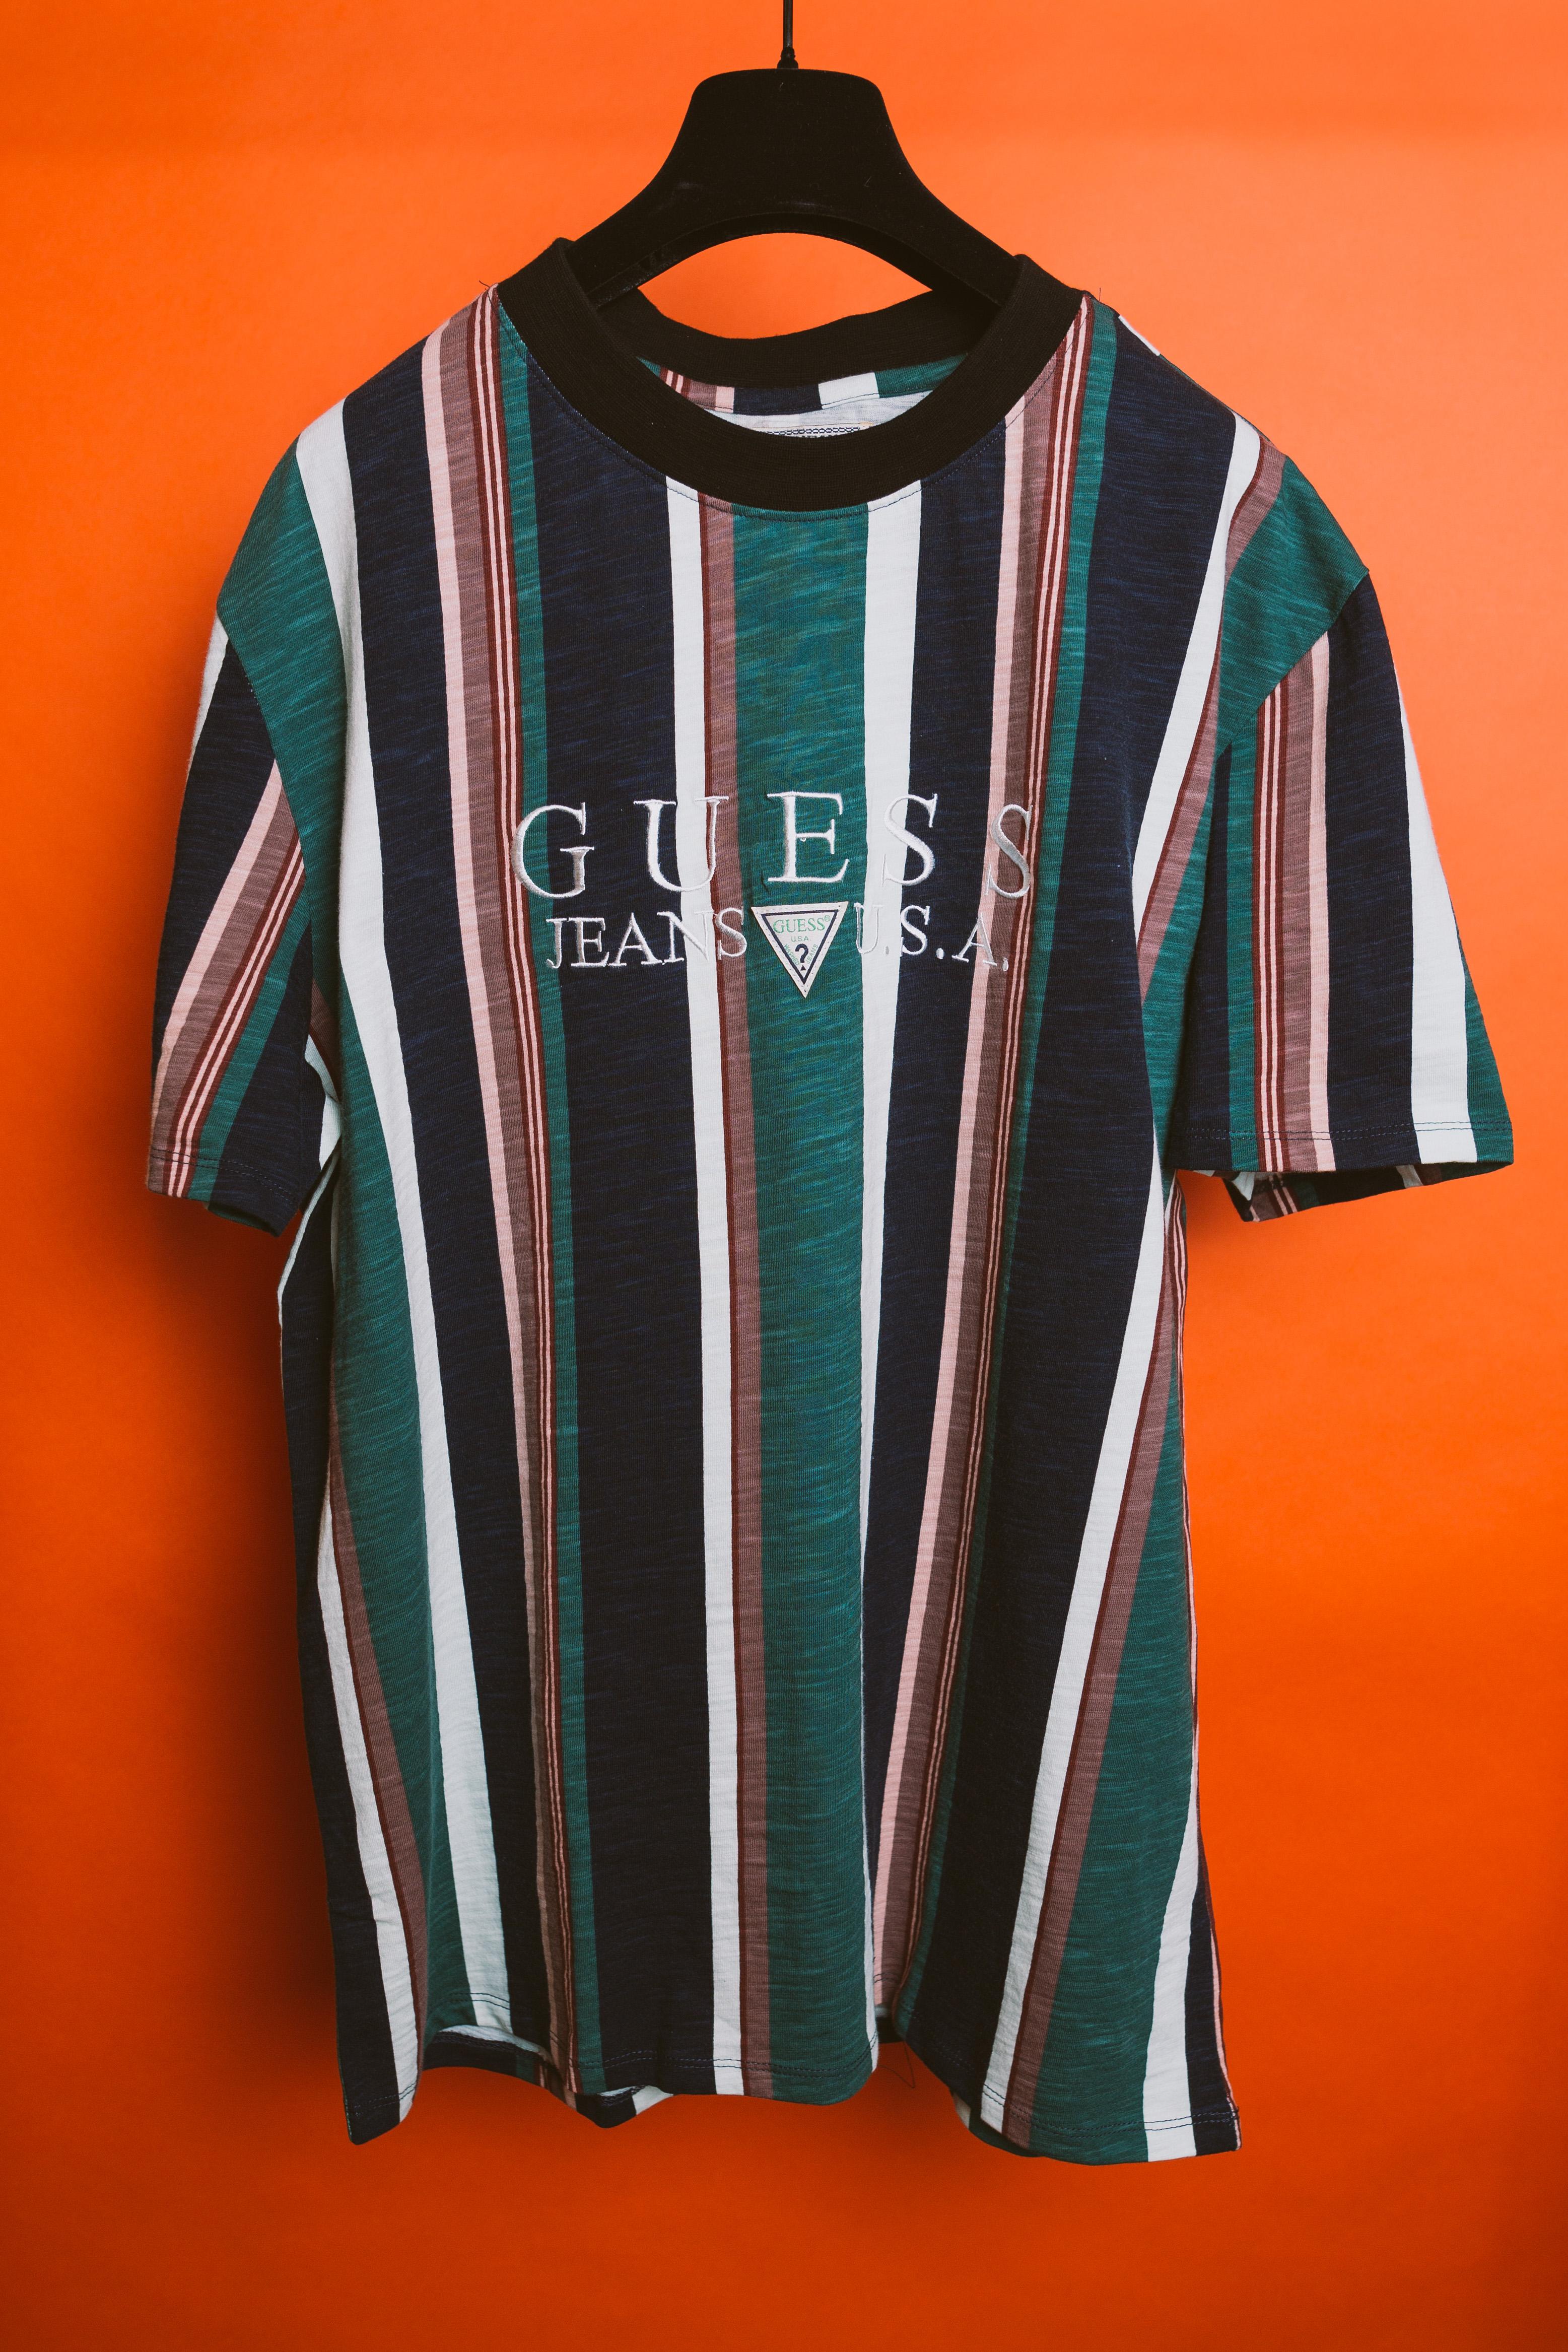 f67dd3e4f33c Guess Jeans Usa 1981 Capsule Striped T Shirt Asap Vintage Vertical ...